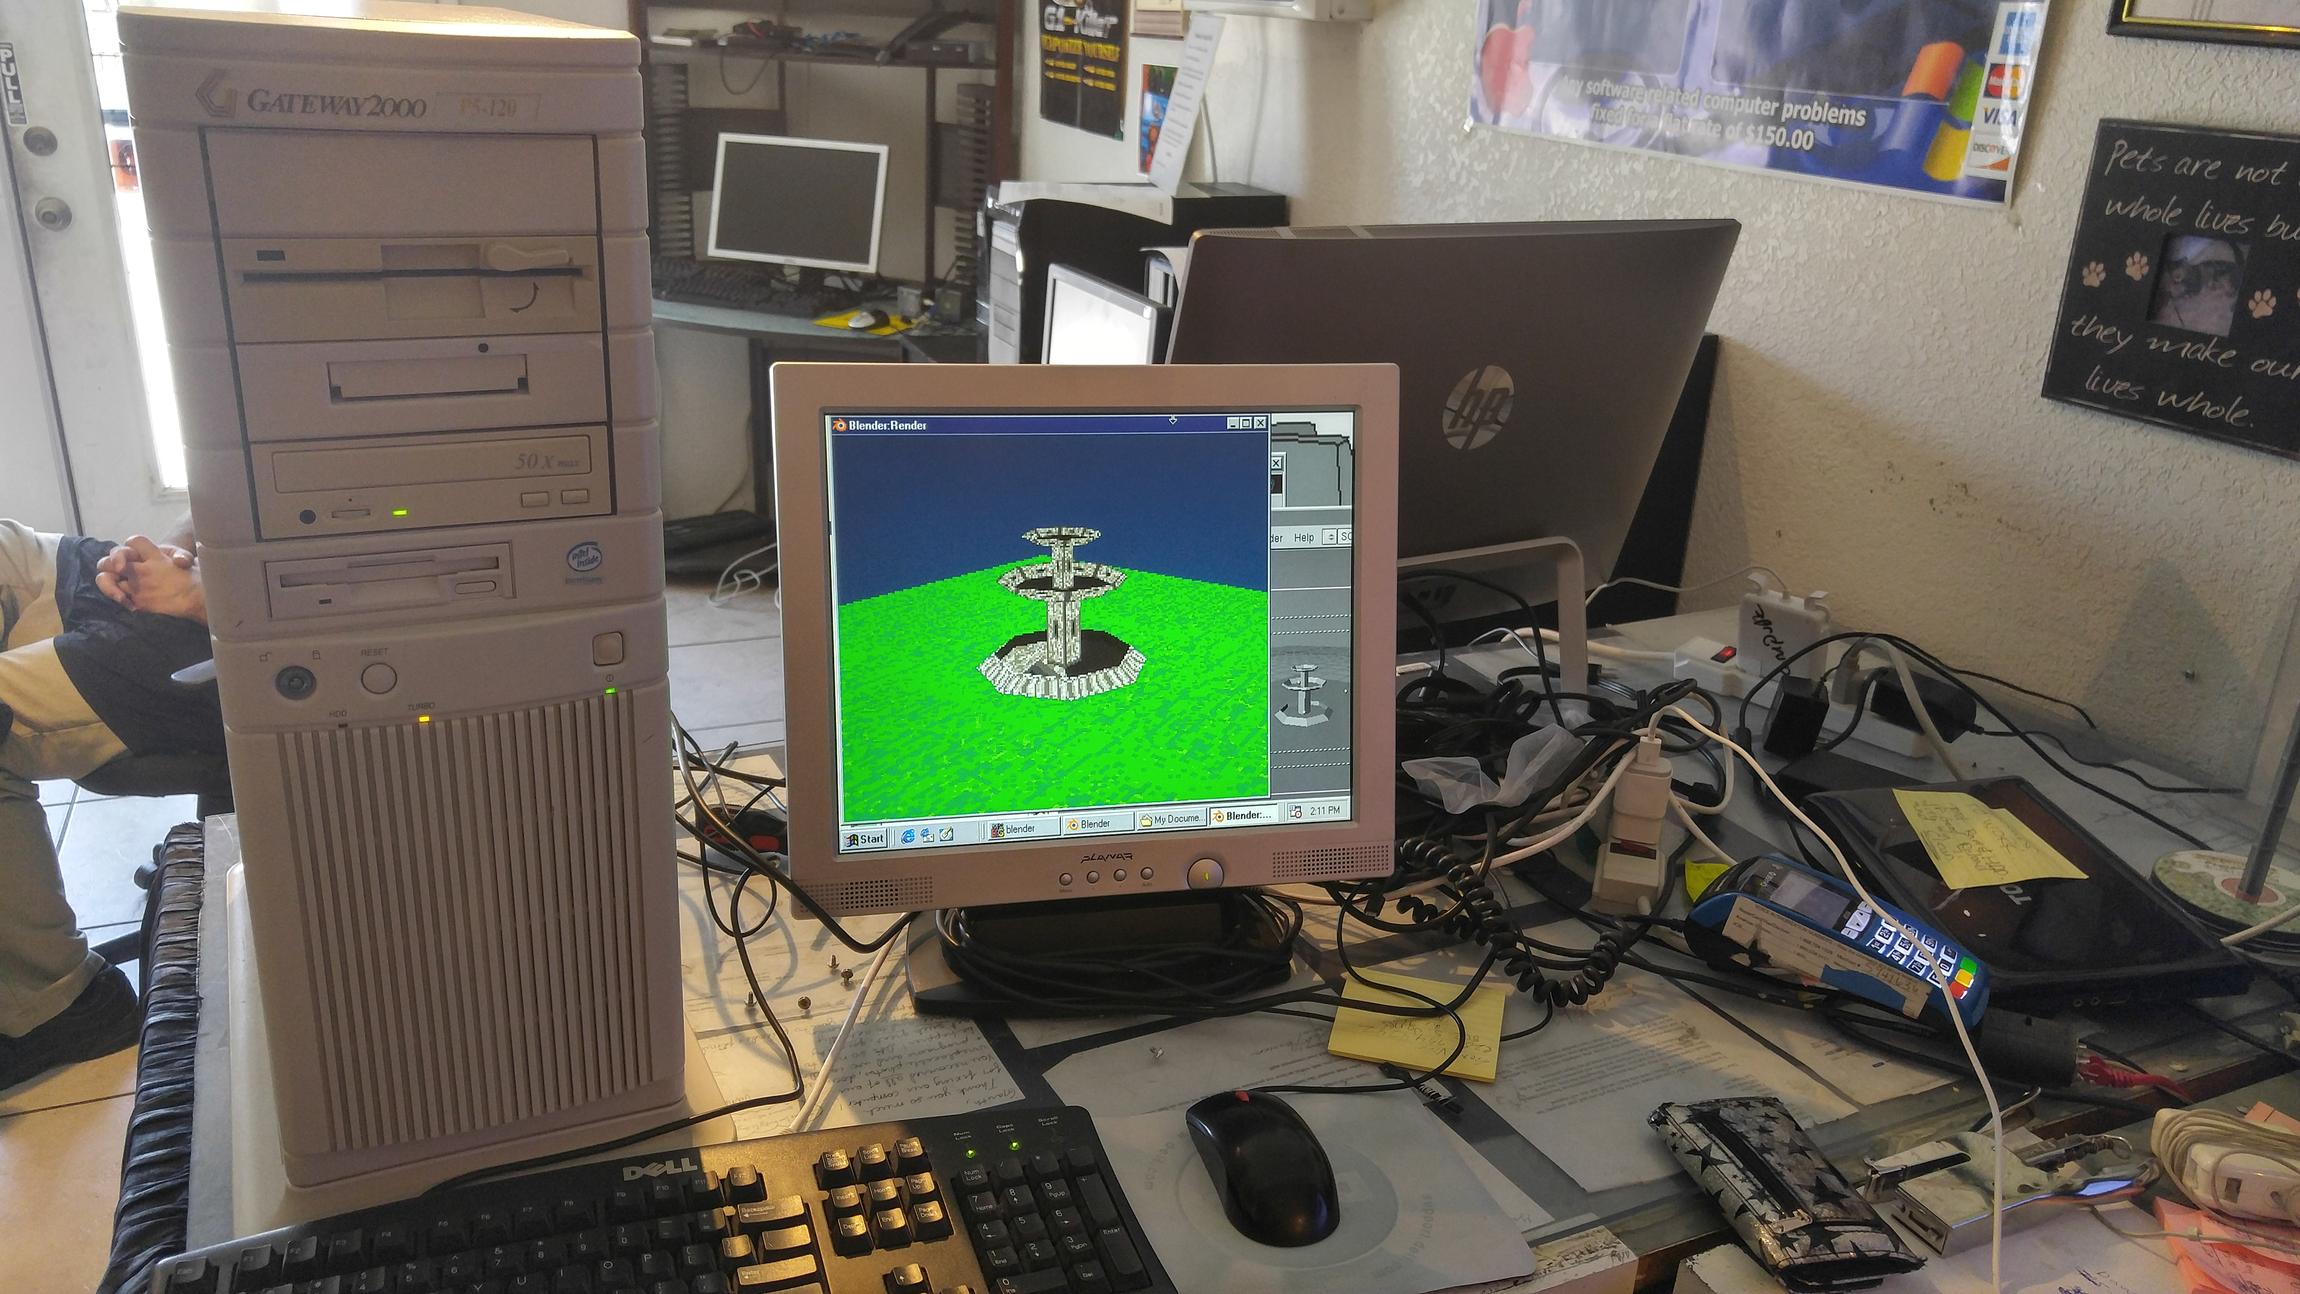 22 year old PC vs  Blender and 3D graphics - Blender Tests